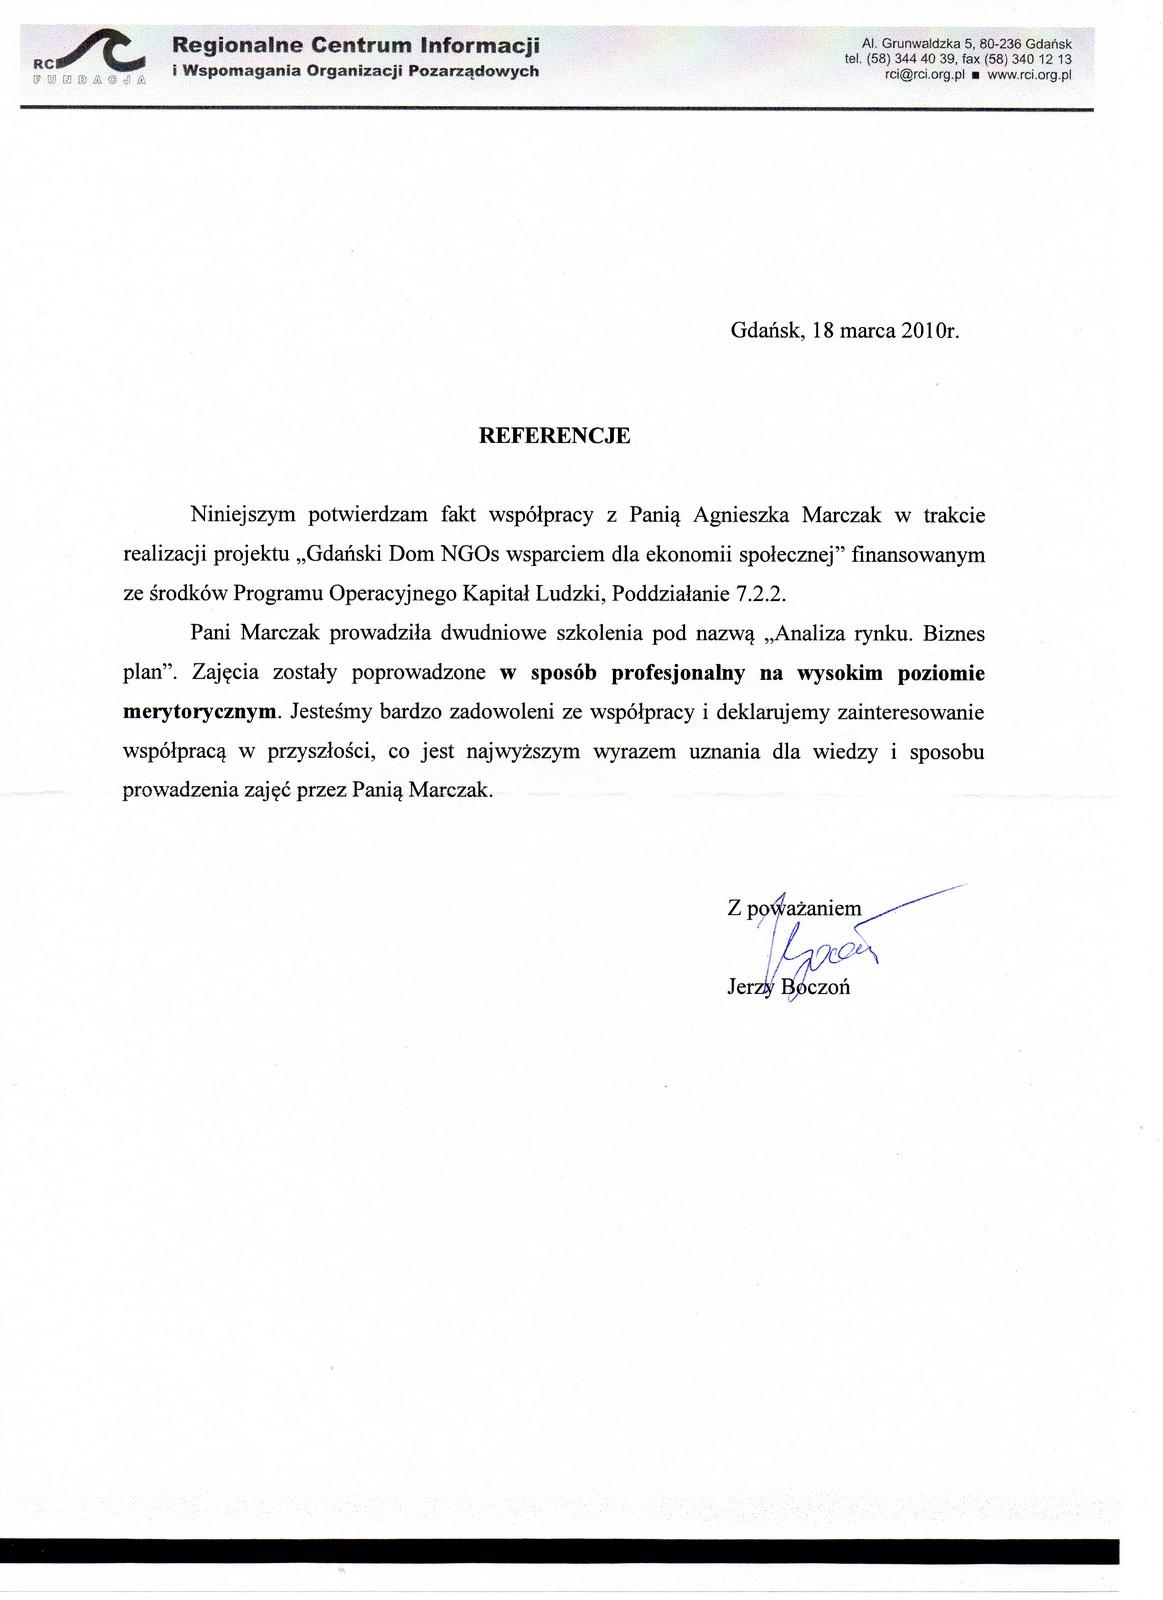 Referencje Fundacja RC